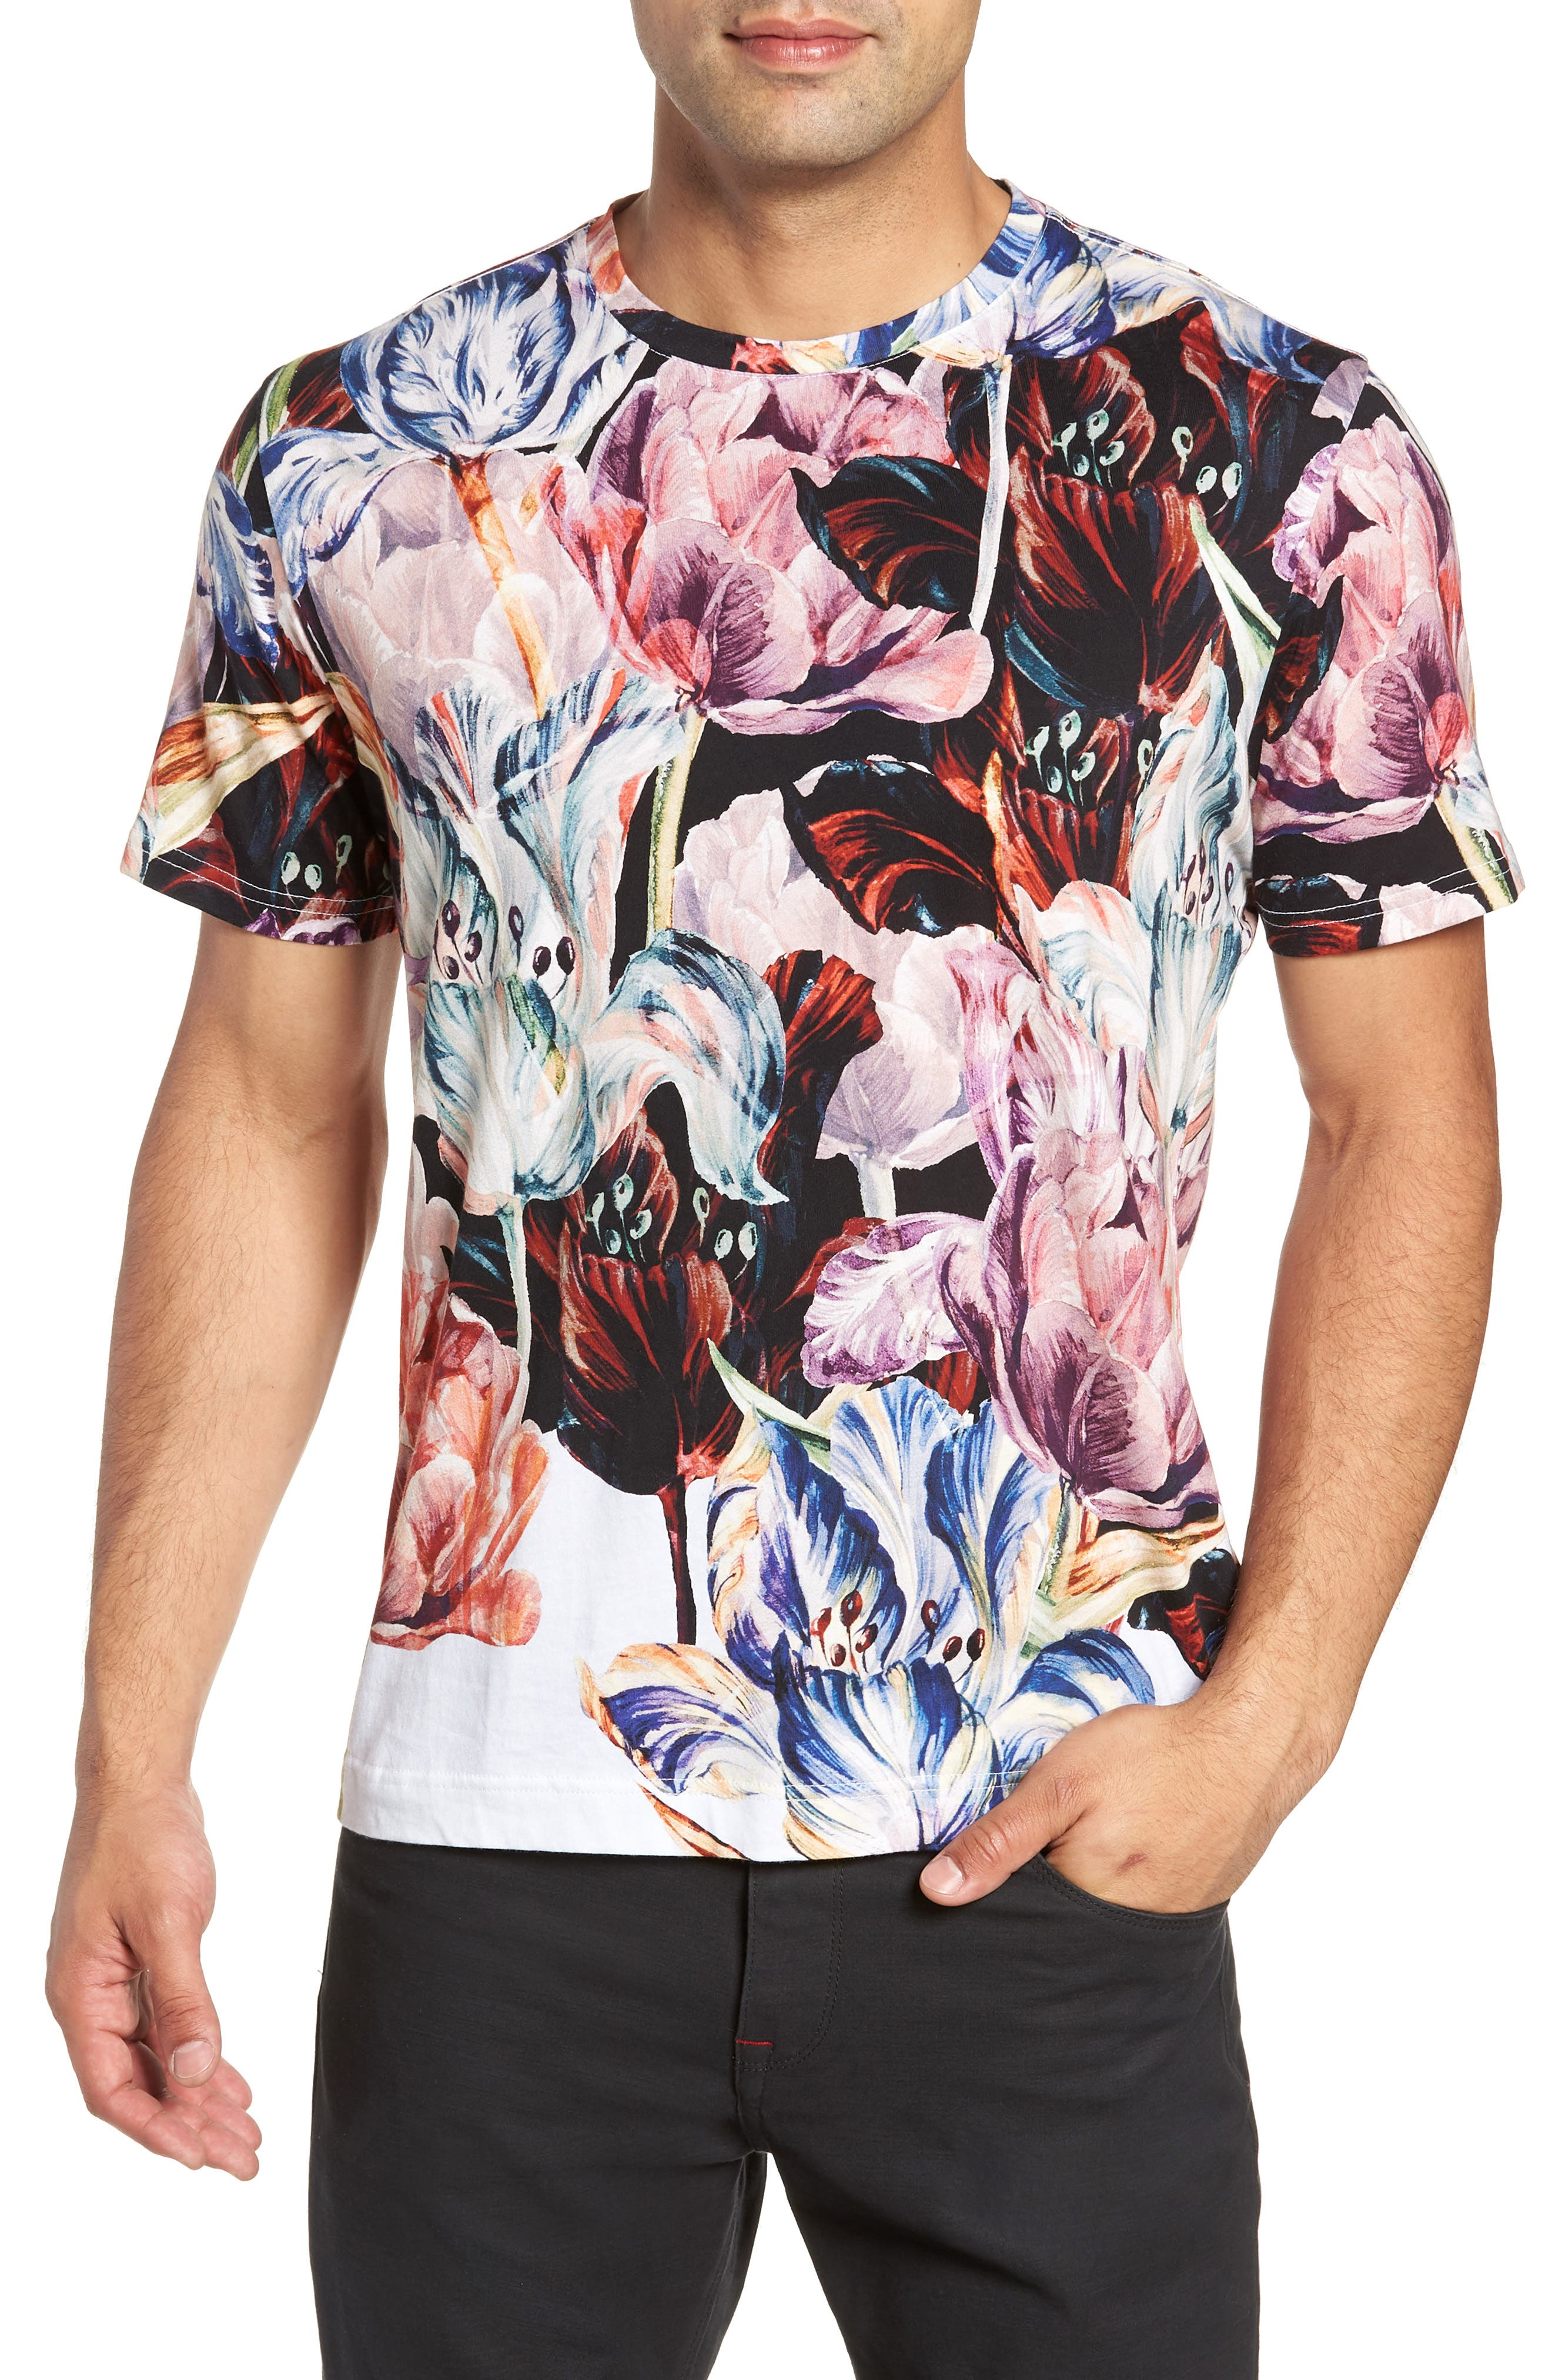 Eddystone T-Shirt,                             Main thumbnail 1, color,                             650